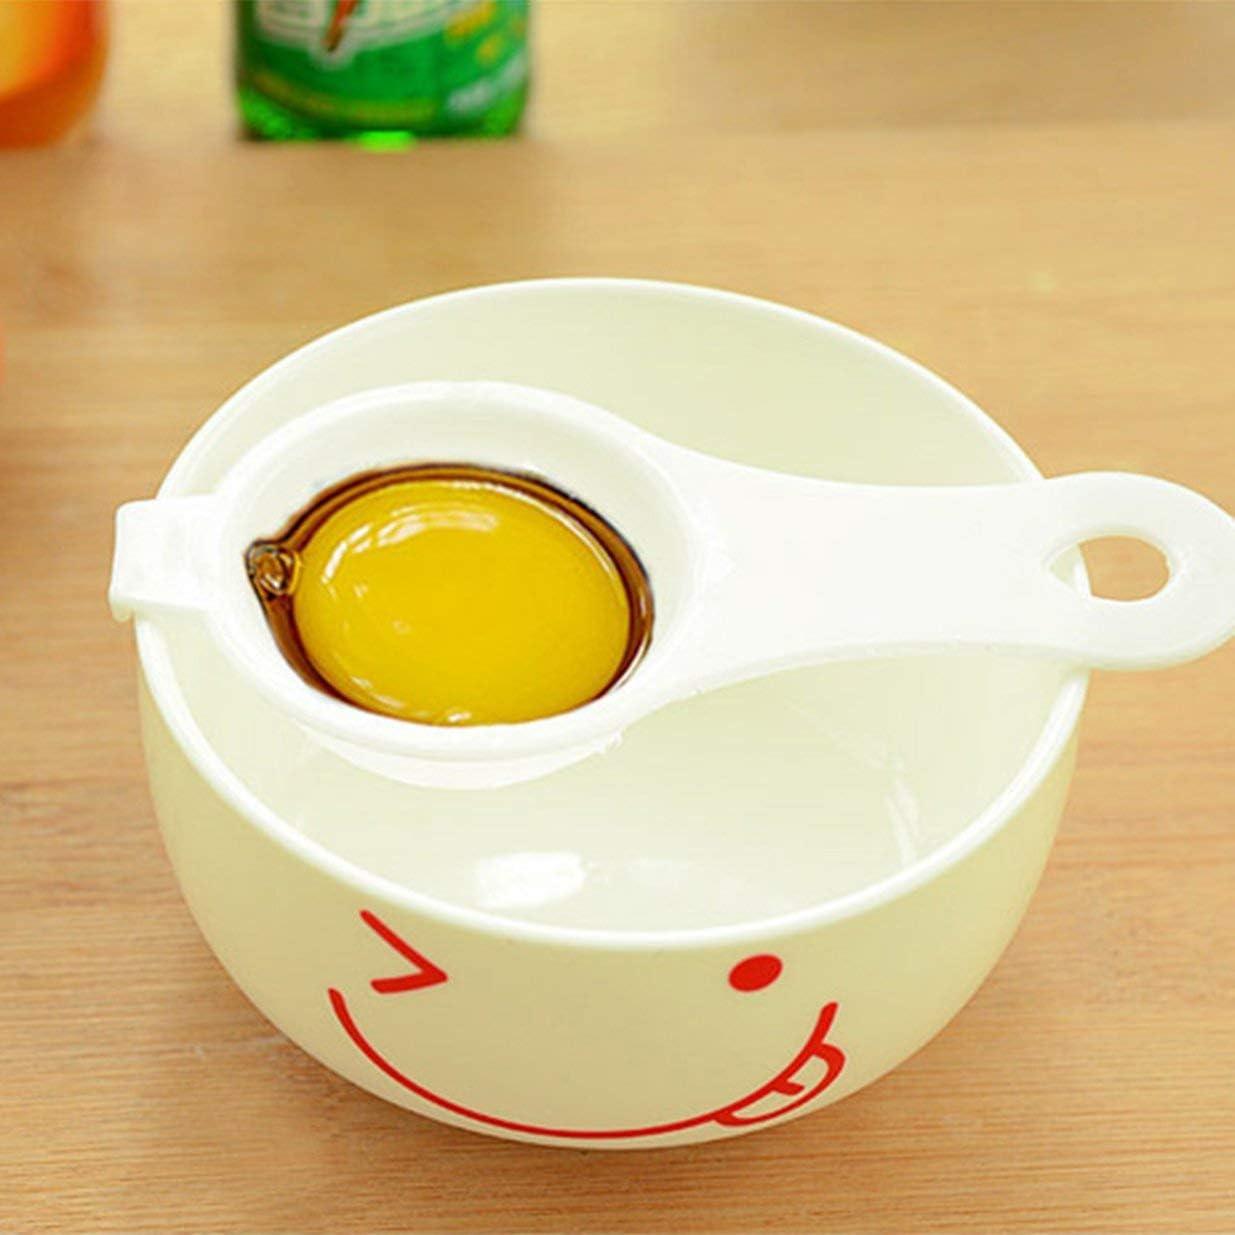 White Portable Egg Yolk White Separator Plastic Egg Divider with Collecting Base Bowl Yolk Catcher Home Kitchen Gadgets